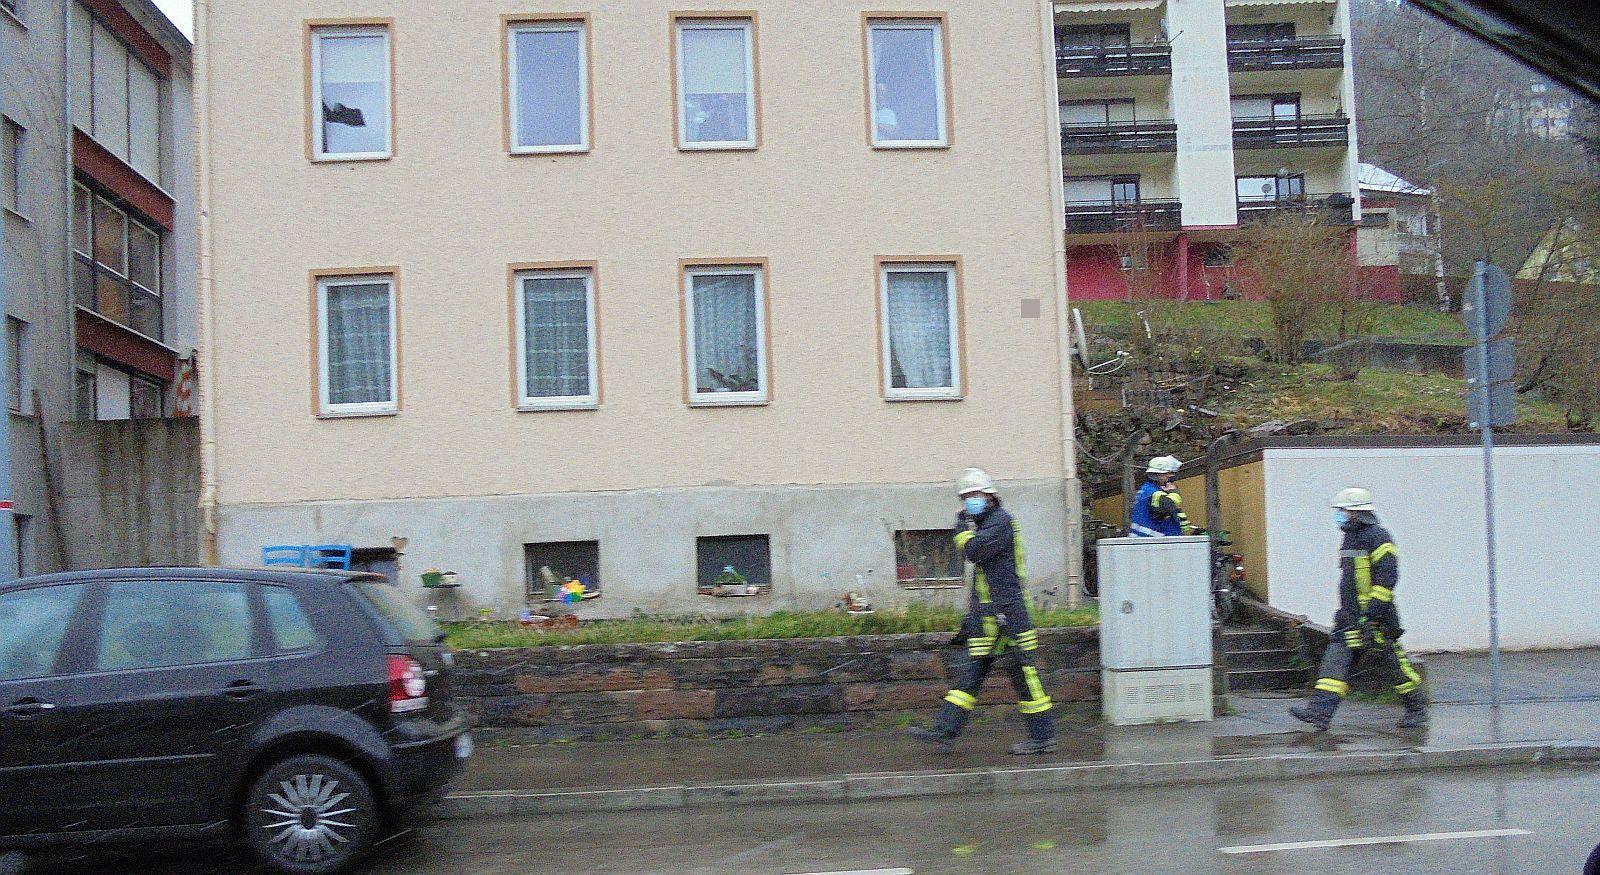 Auf dem Weg zum  defekten Gasboiler. Foto: him